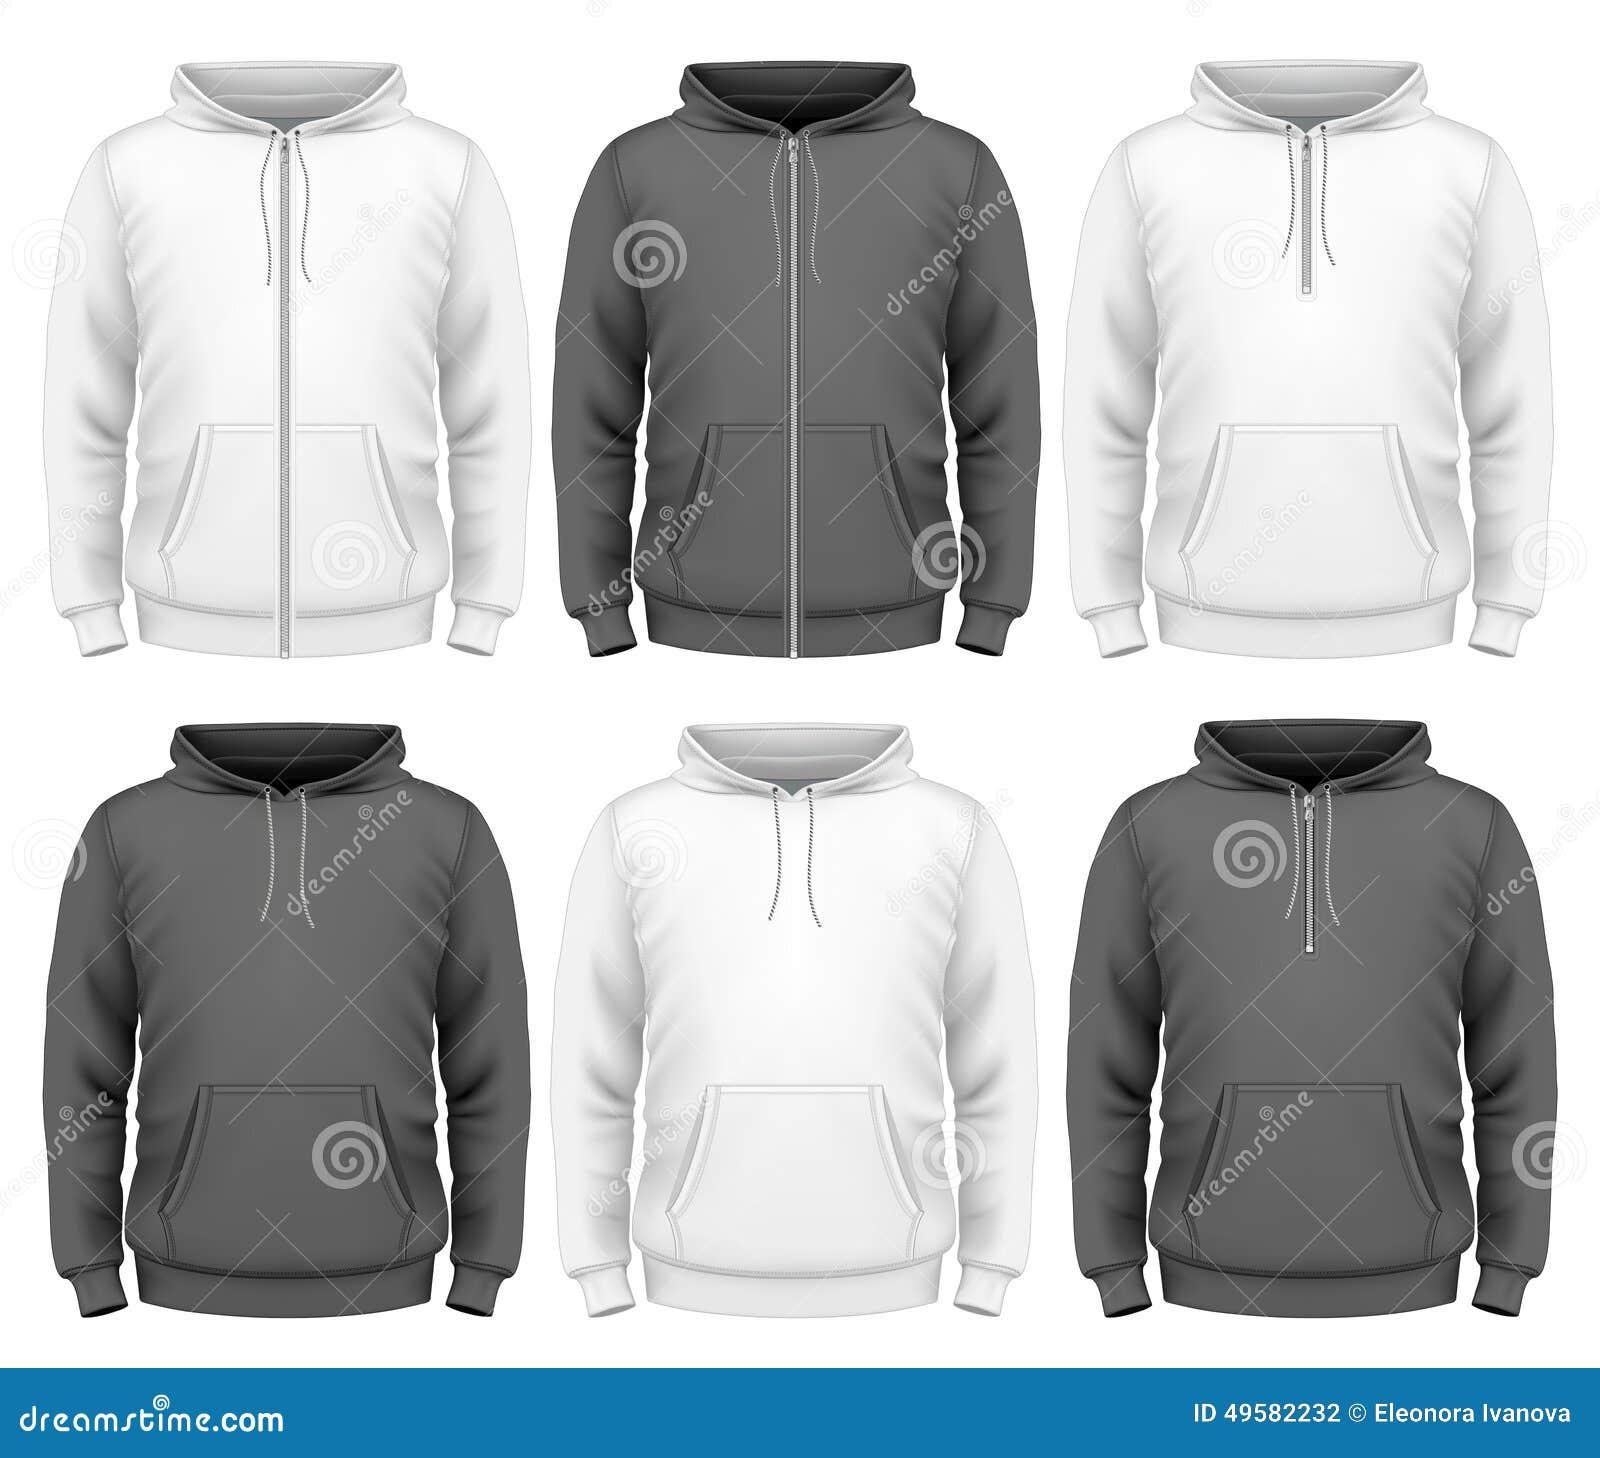 Men hoodie stock vector. Illustration of illustration - 49582232